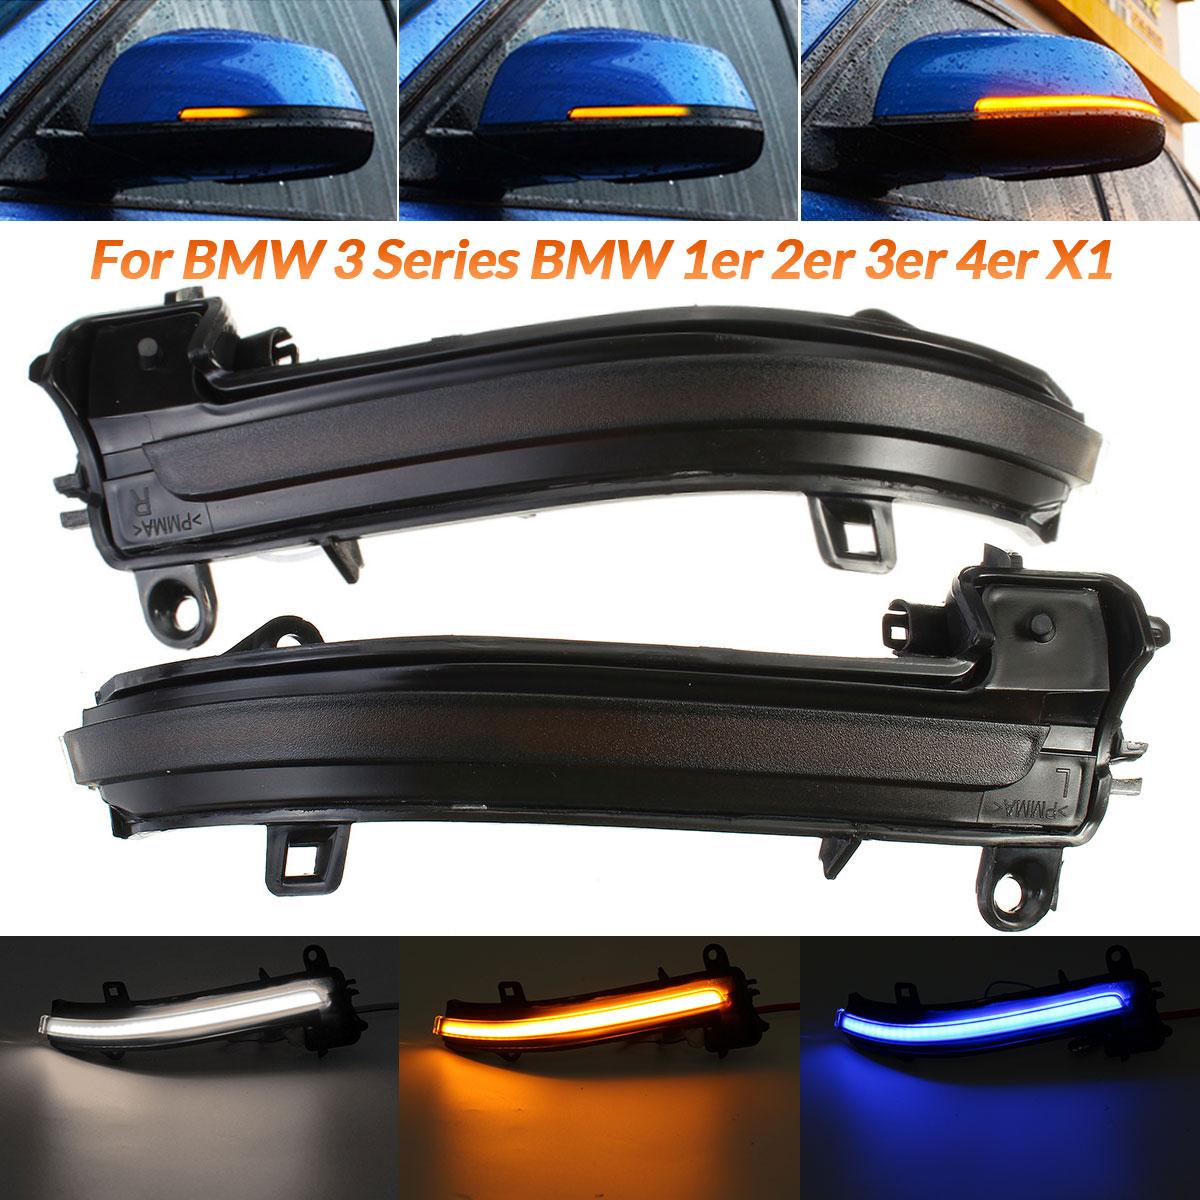 Luces LED intermitentes dinámicas 2 uds., indicador de luz de espejo lateral para BMW F20 F30 F31 F21 F22 F23 F32 F33 F34 X1 E84 F36 1 2 3 4